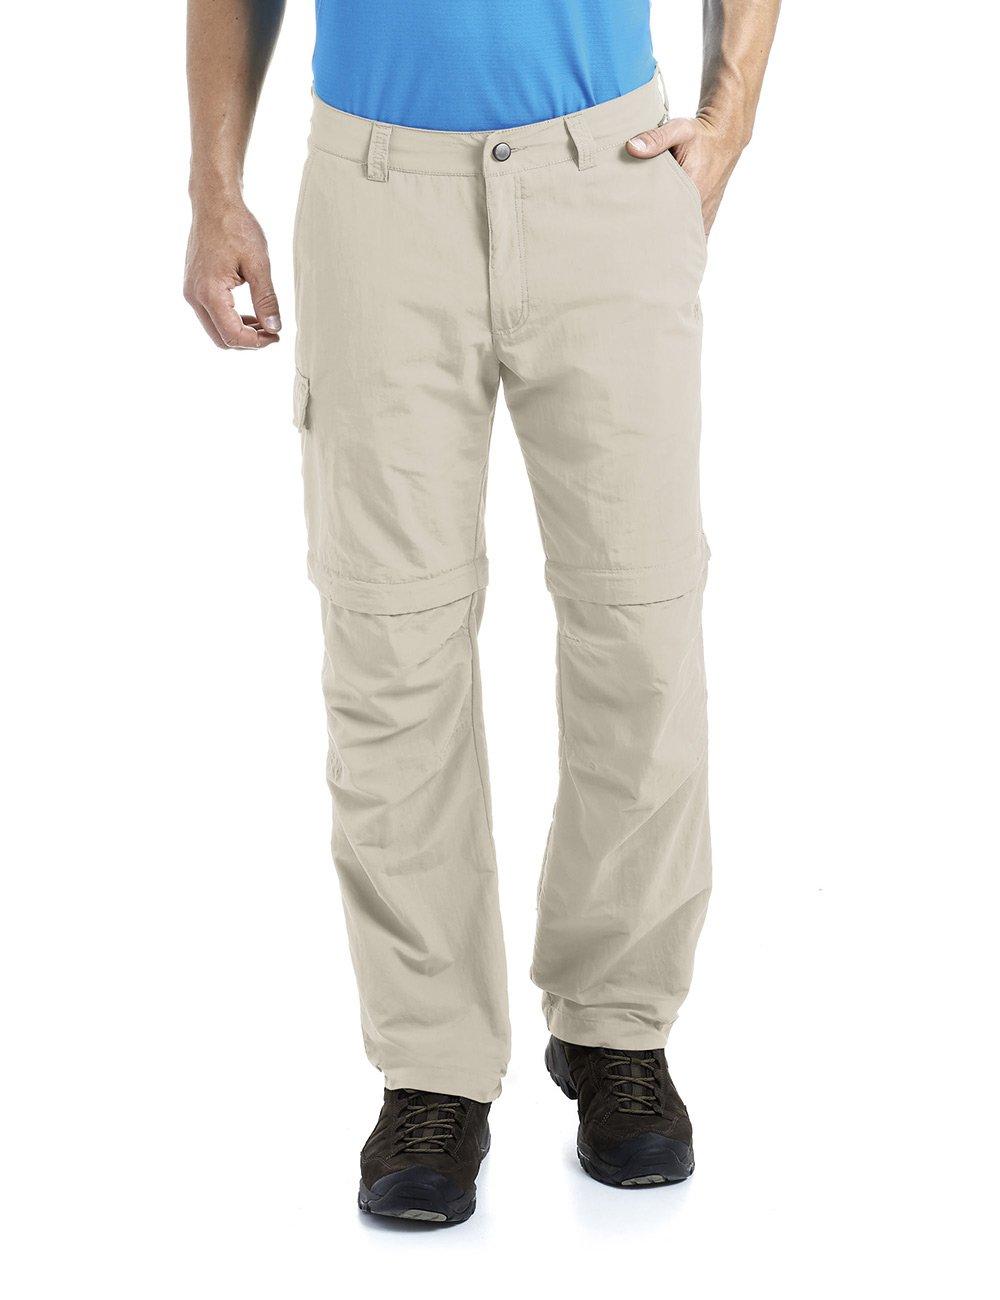 MAIER SPORTS Herren Zipp-Off Hose Trave aus 100% PA in 12 Größen, Funktionshose  Outdoorhose  Wanderhose, abzippbar und schnelltrocknend,